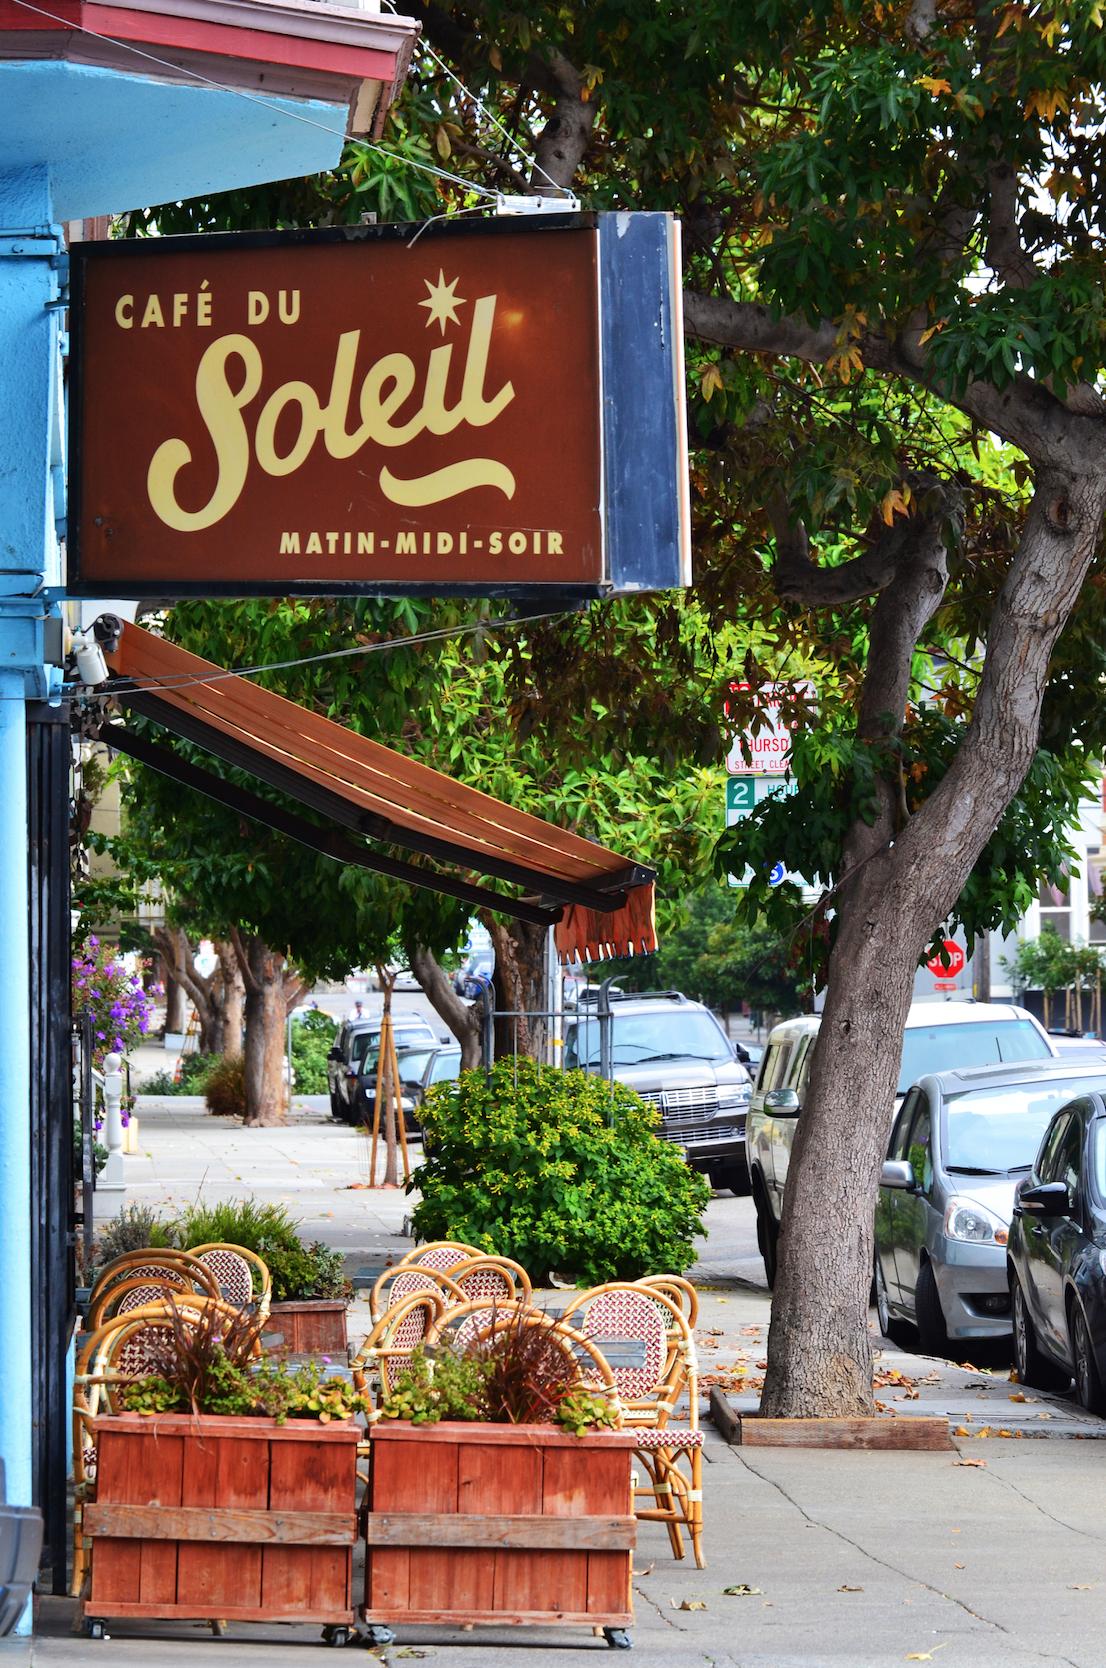 Aliana+Grace+Bailey+San+Francisco+California+Cafe.png